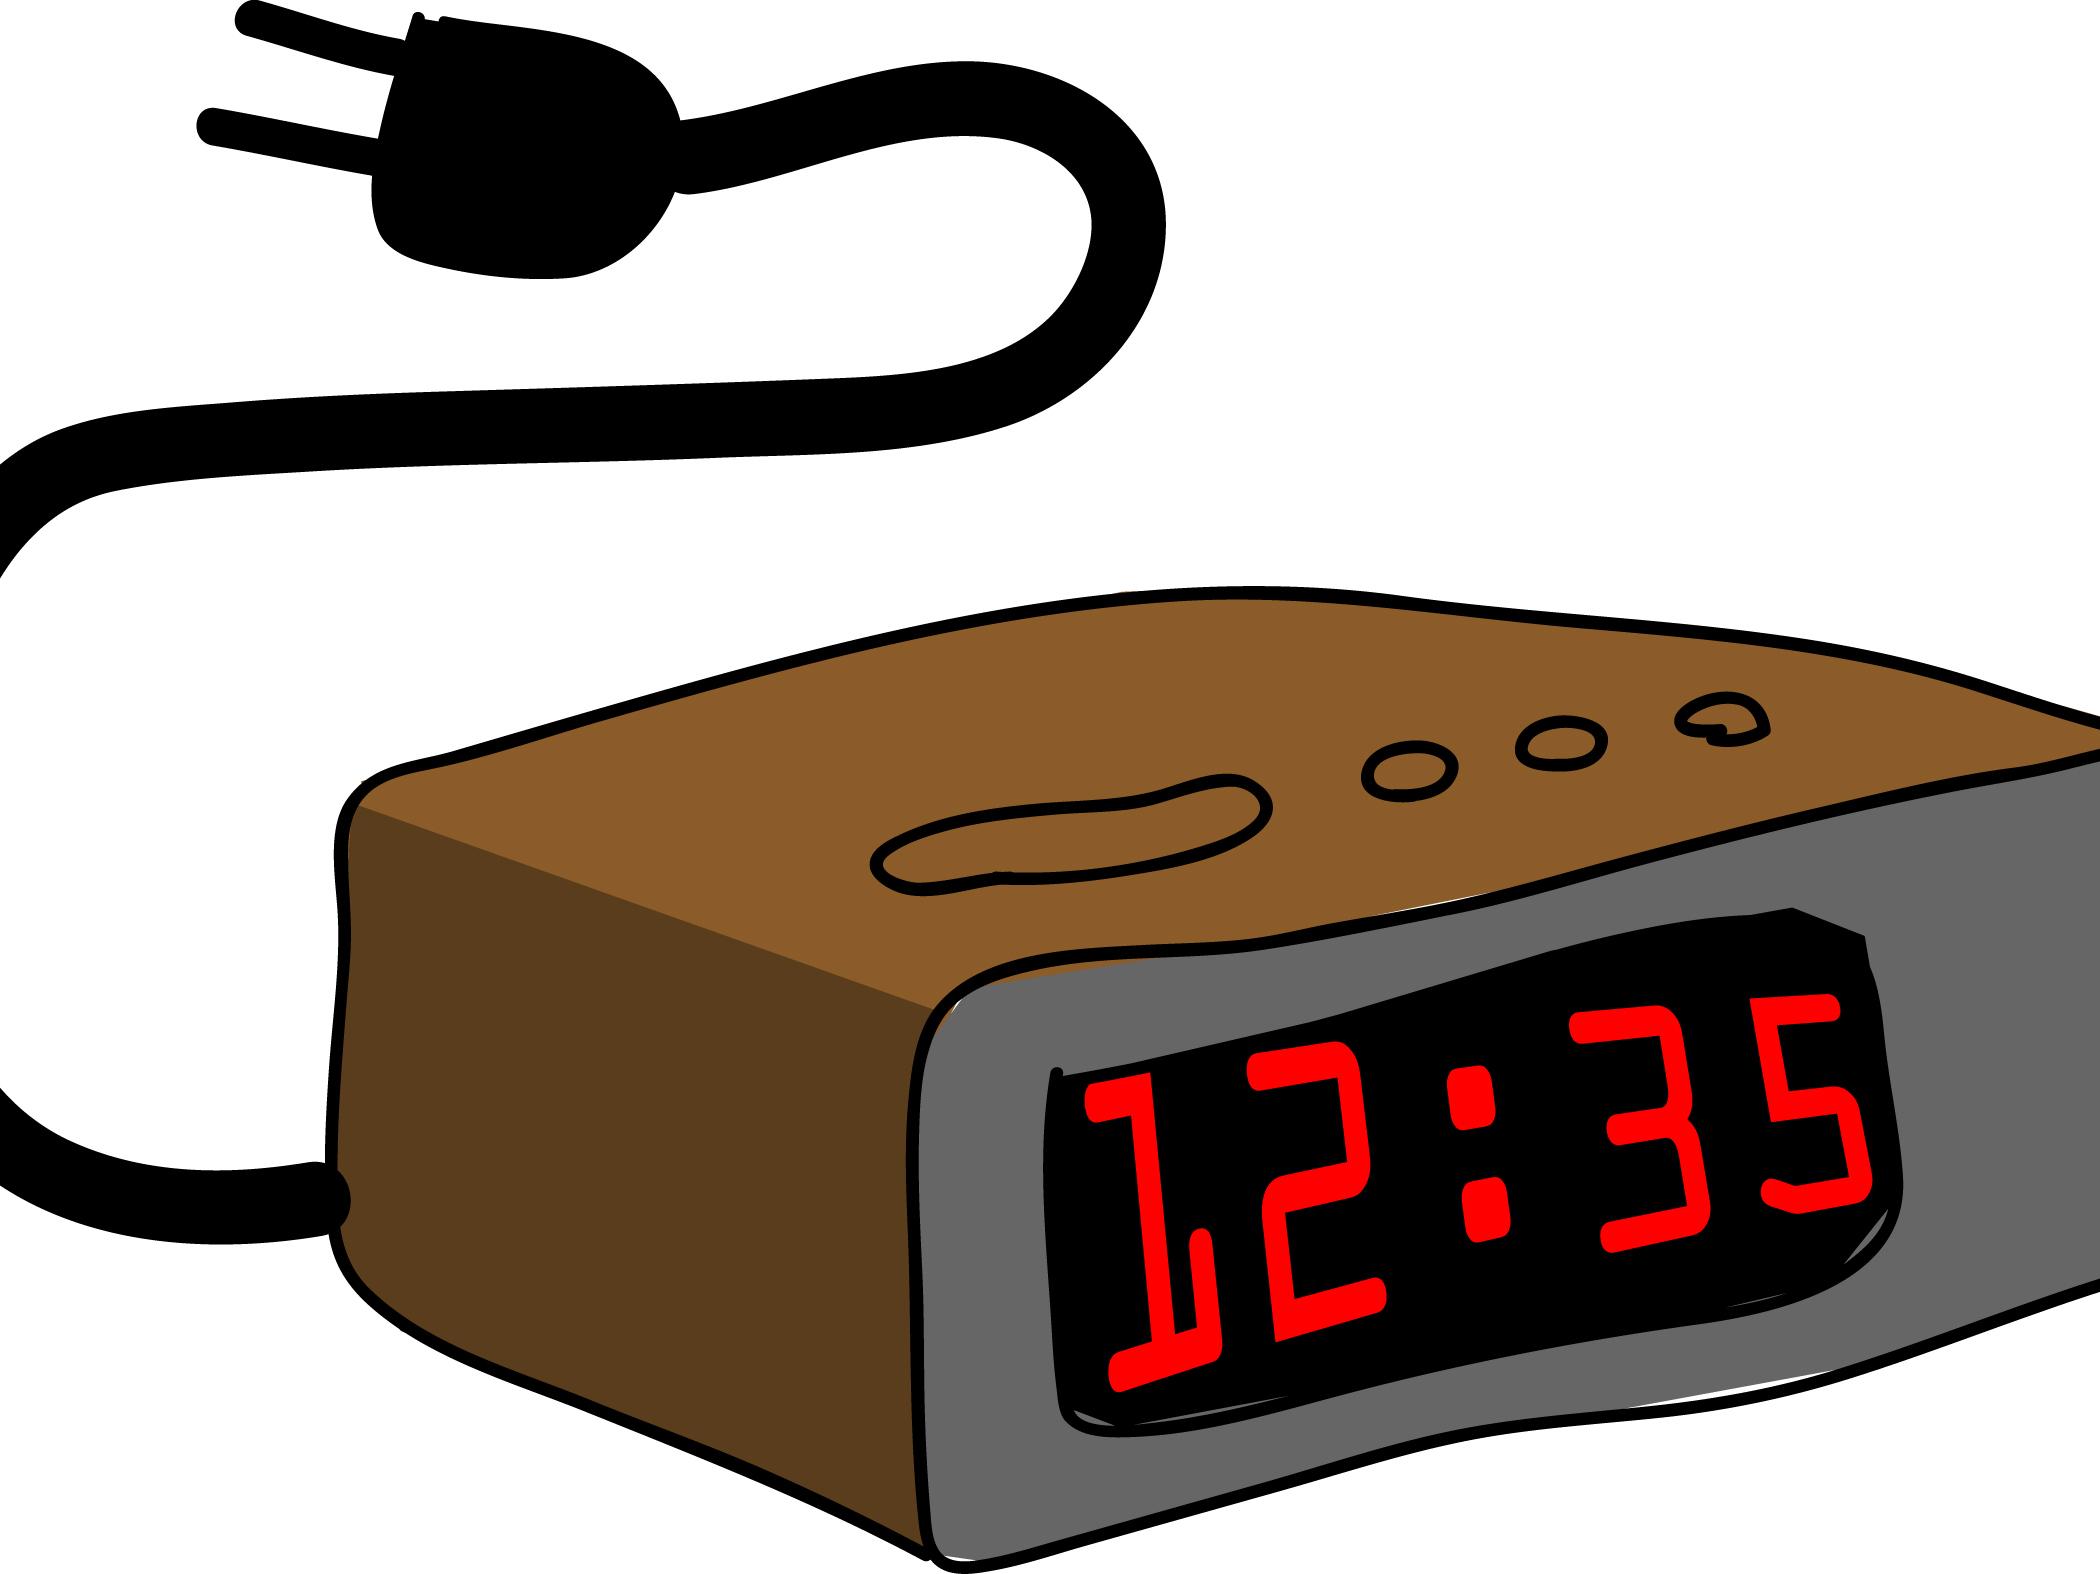 alarm clock drawing at getdrawings com free for personal use alarm rh getdrawings com Six O Clock Alarm Clock Electronic 3 O Clock Alarm Clock